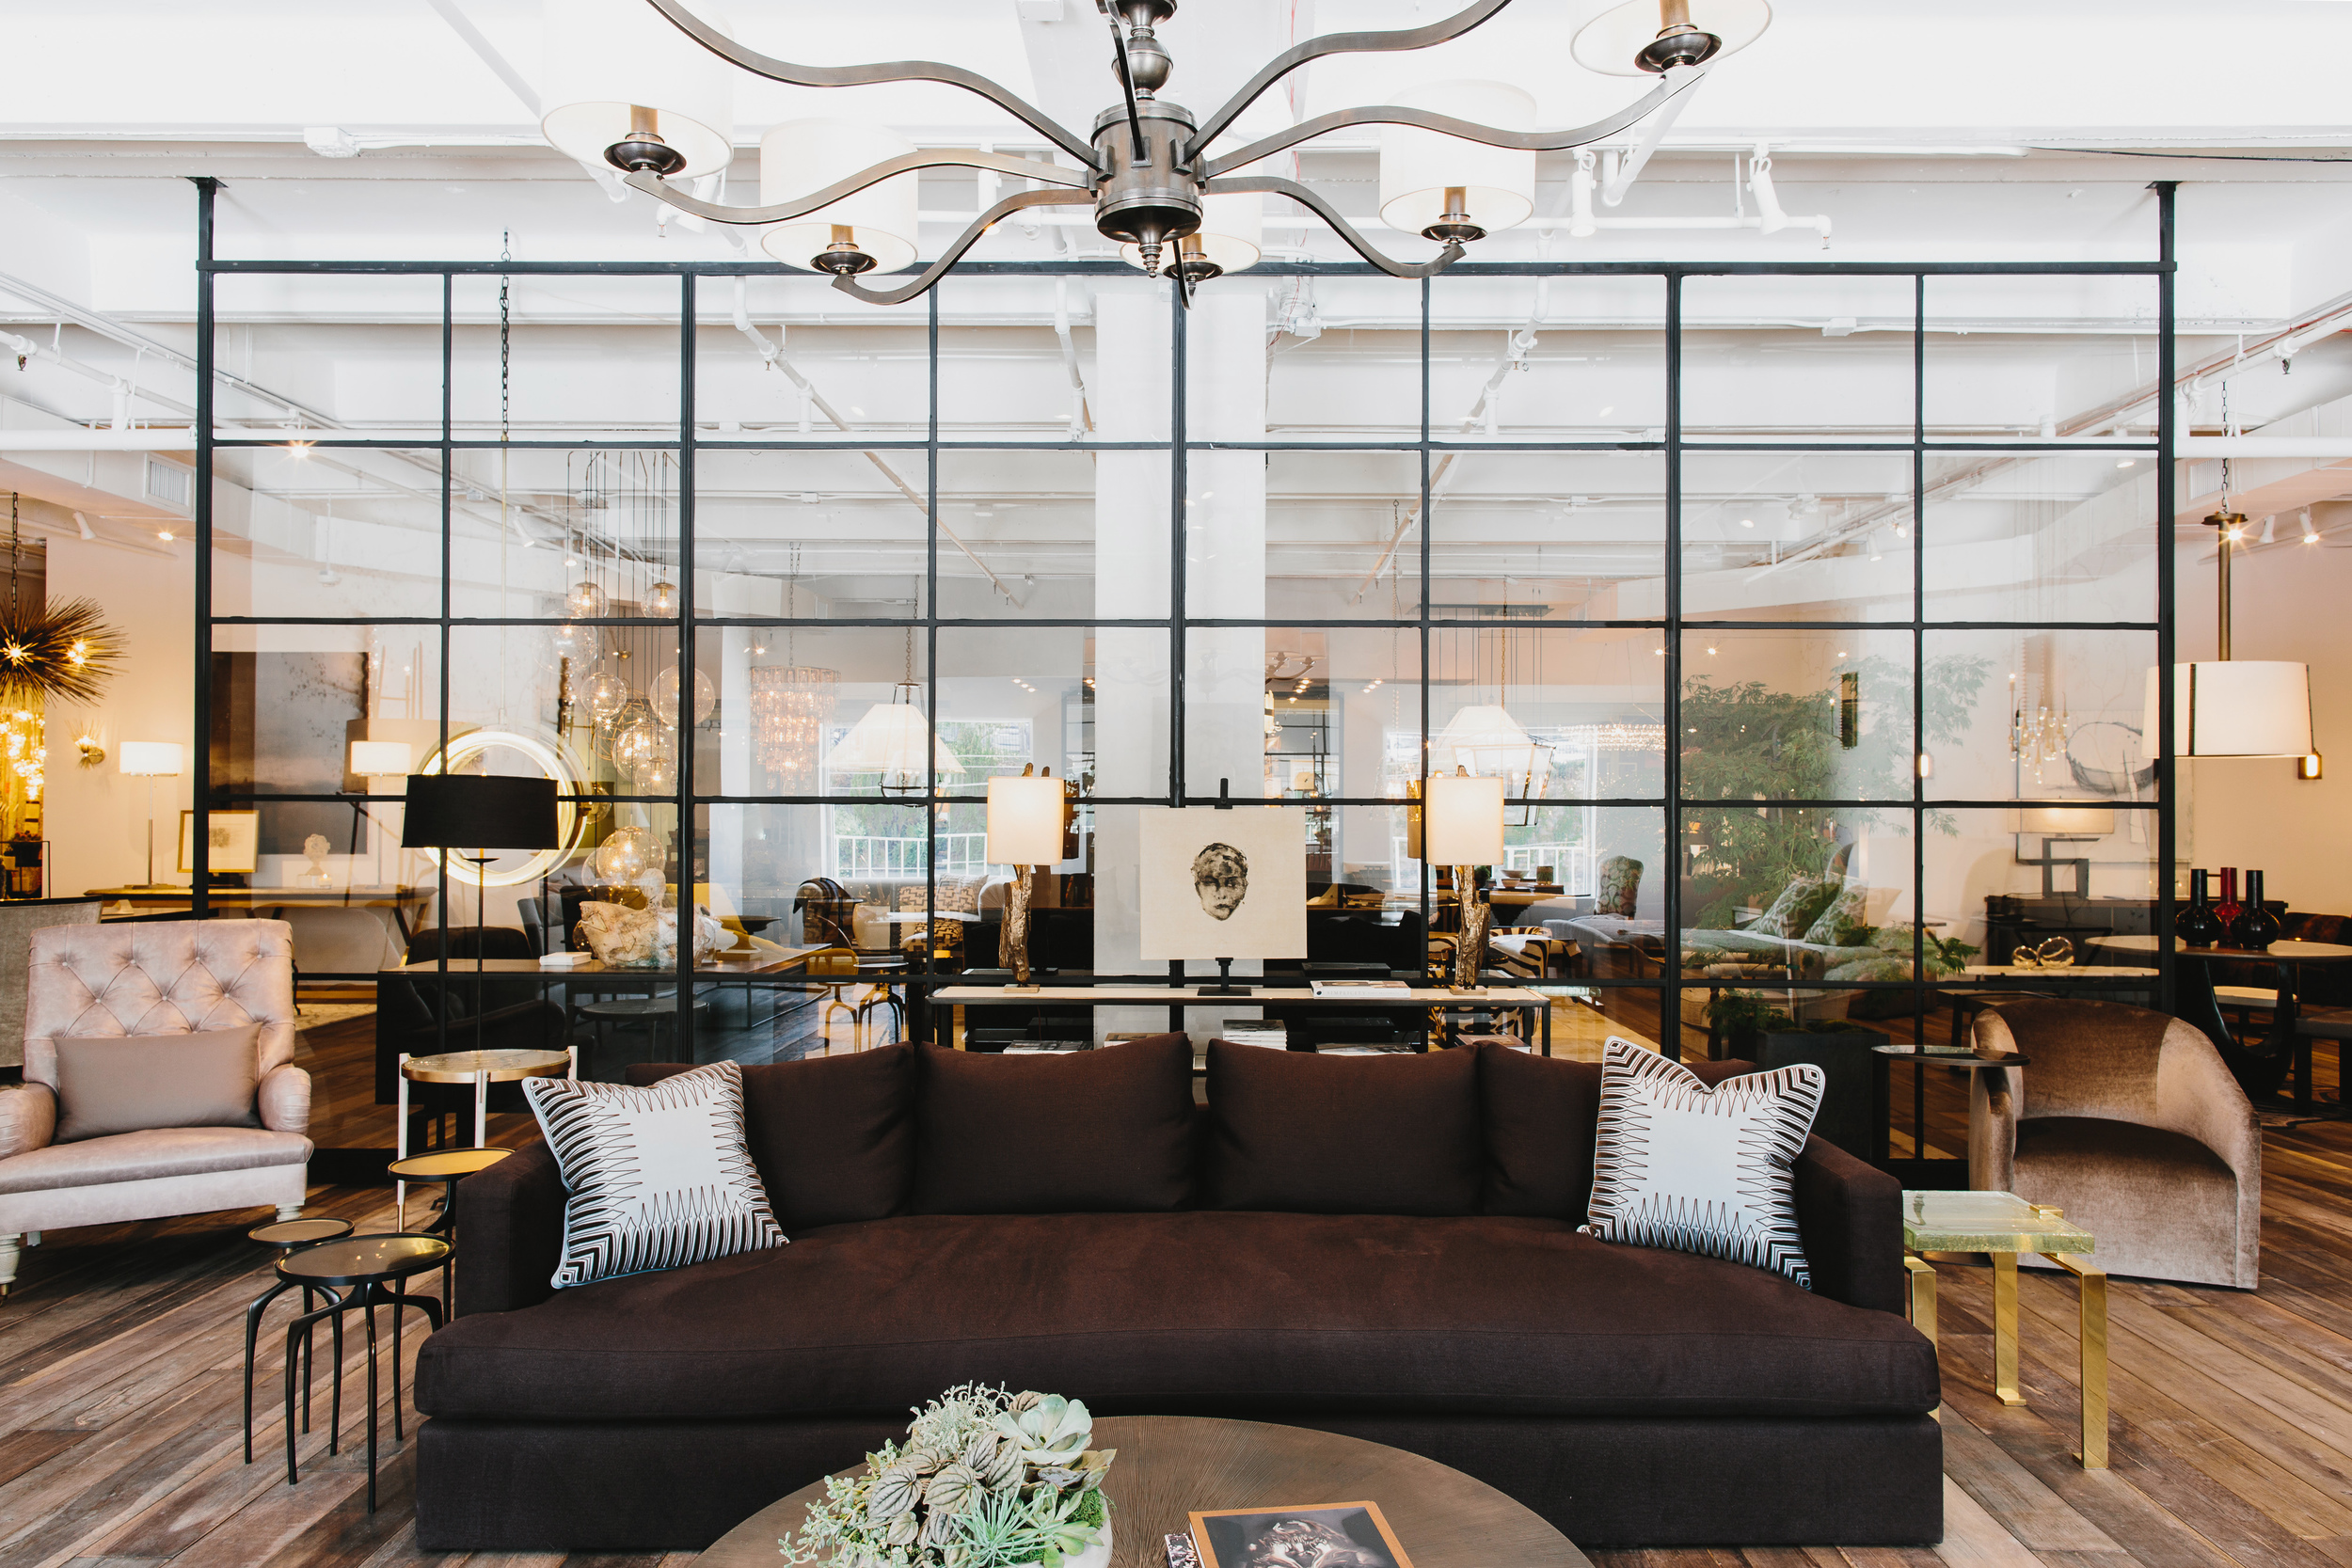 R Hughes Showroom | Smith Hanes. showroom steel and glass window